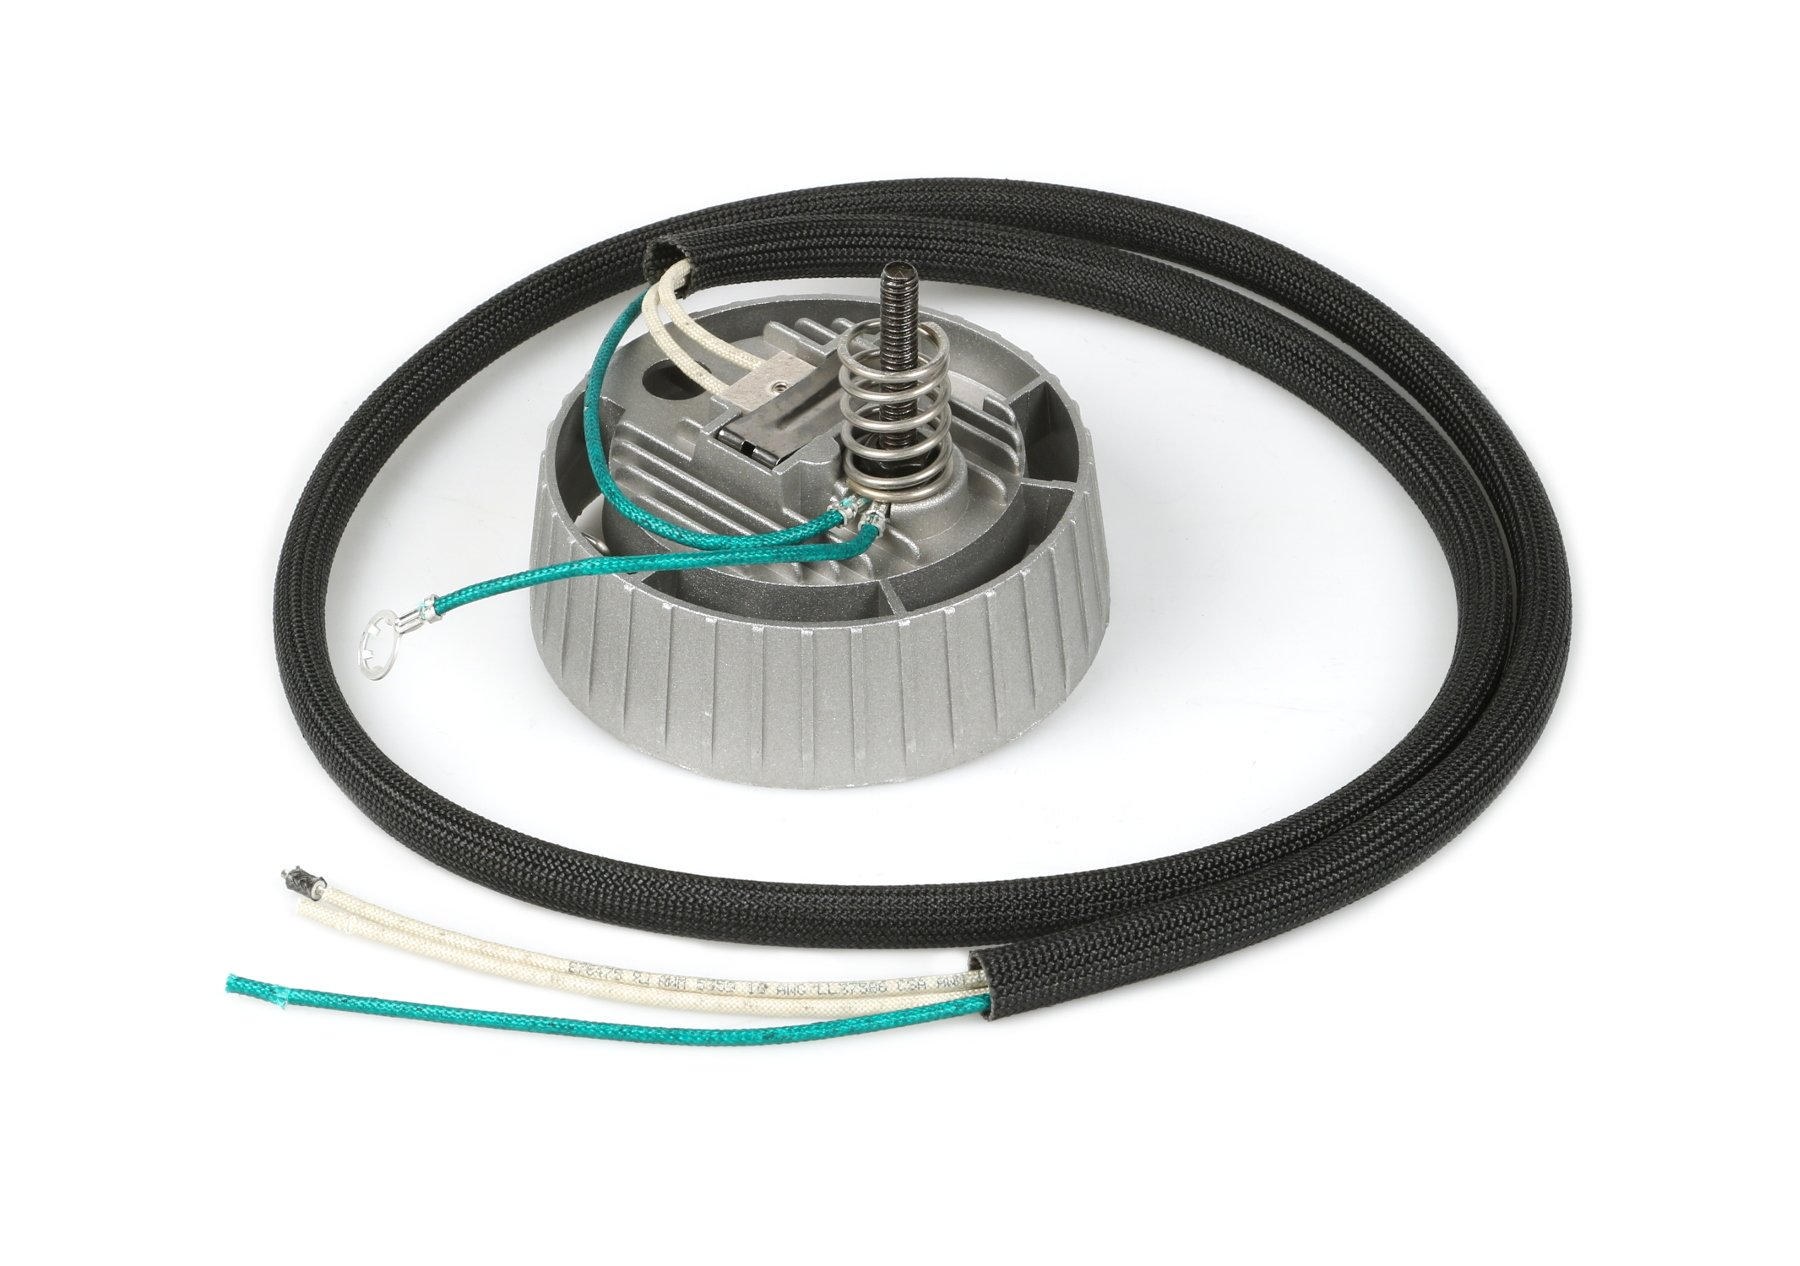 ETC/Elec Theatre Controls 7060A2015 Retrofit Kit For Light Baffle 7060A2015